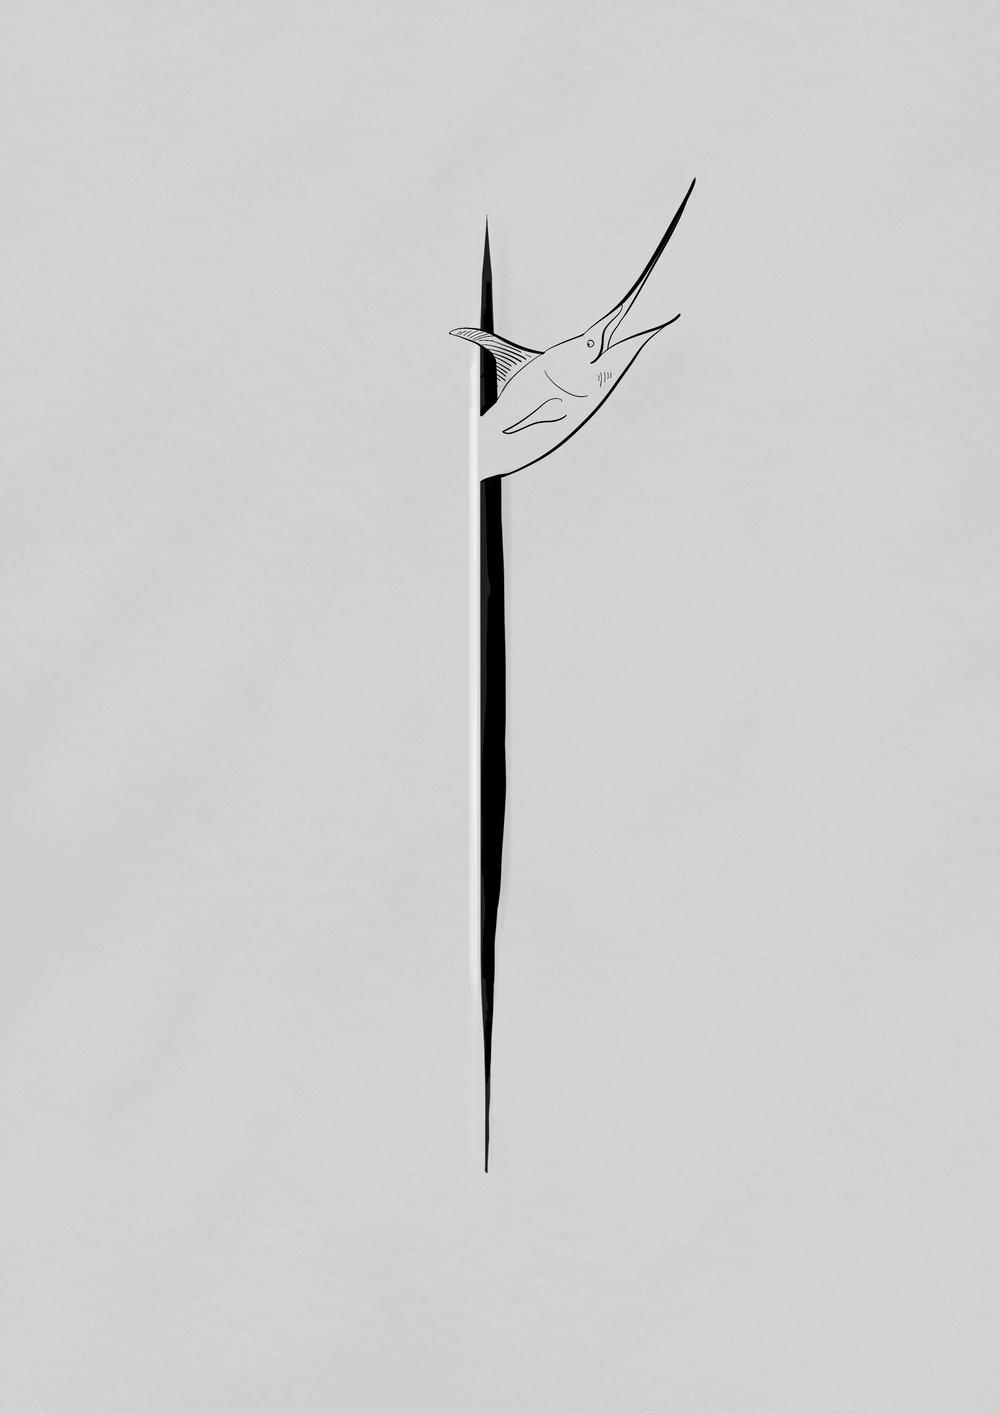 Inktober_6_Sword.jpg